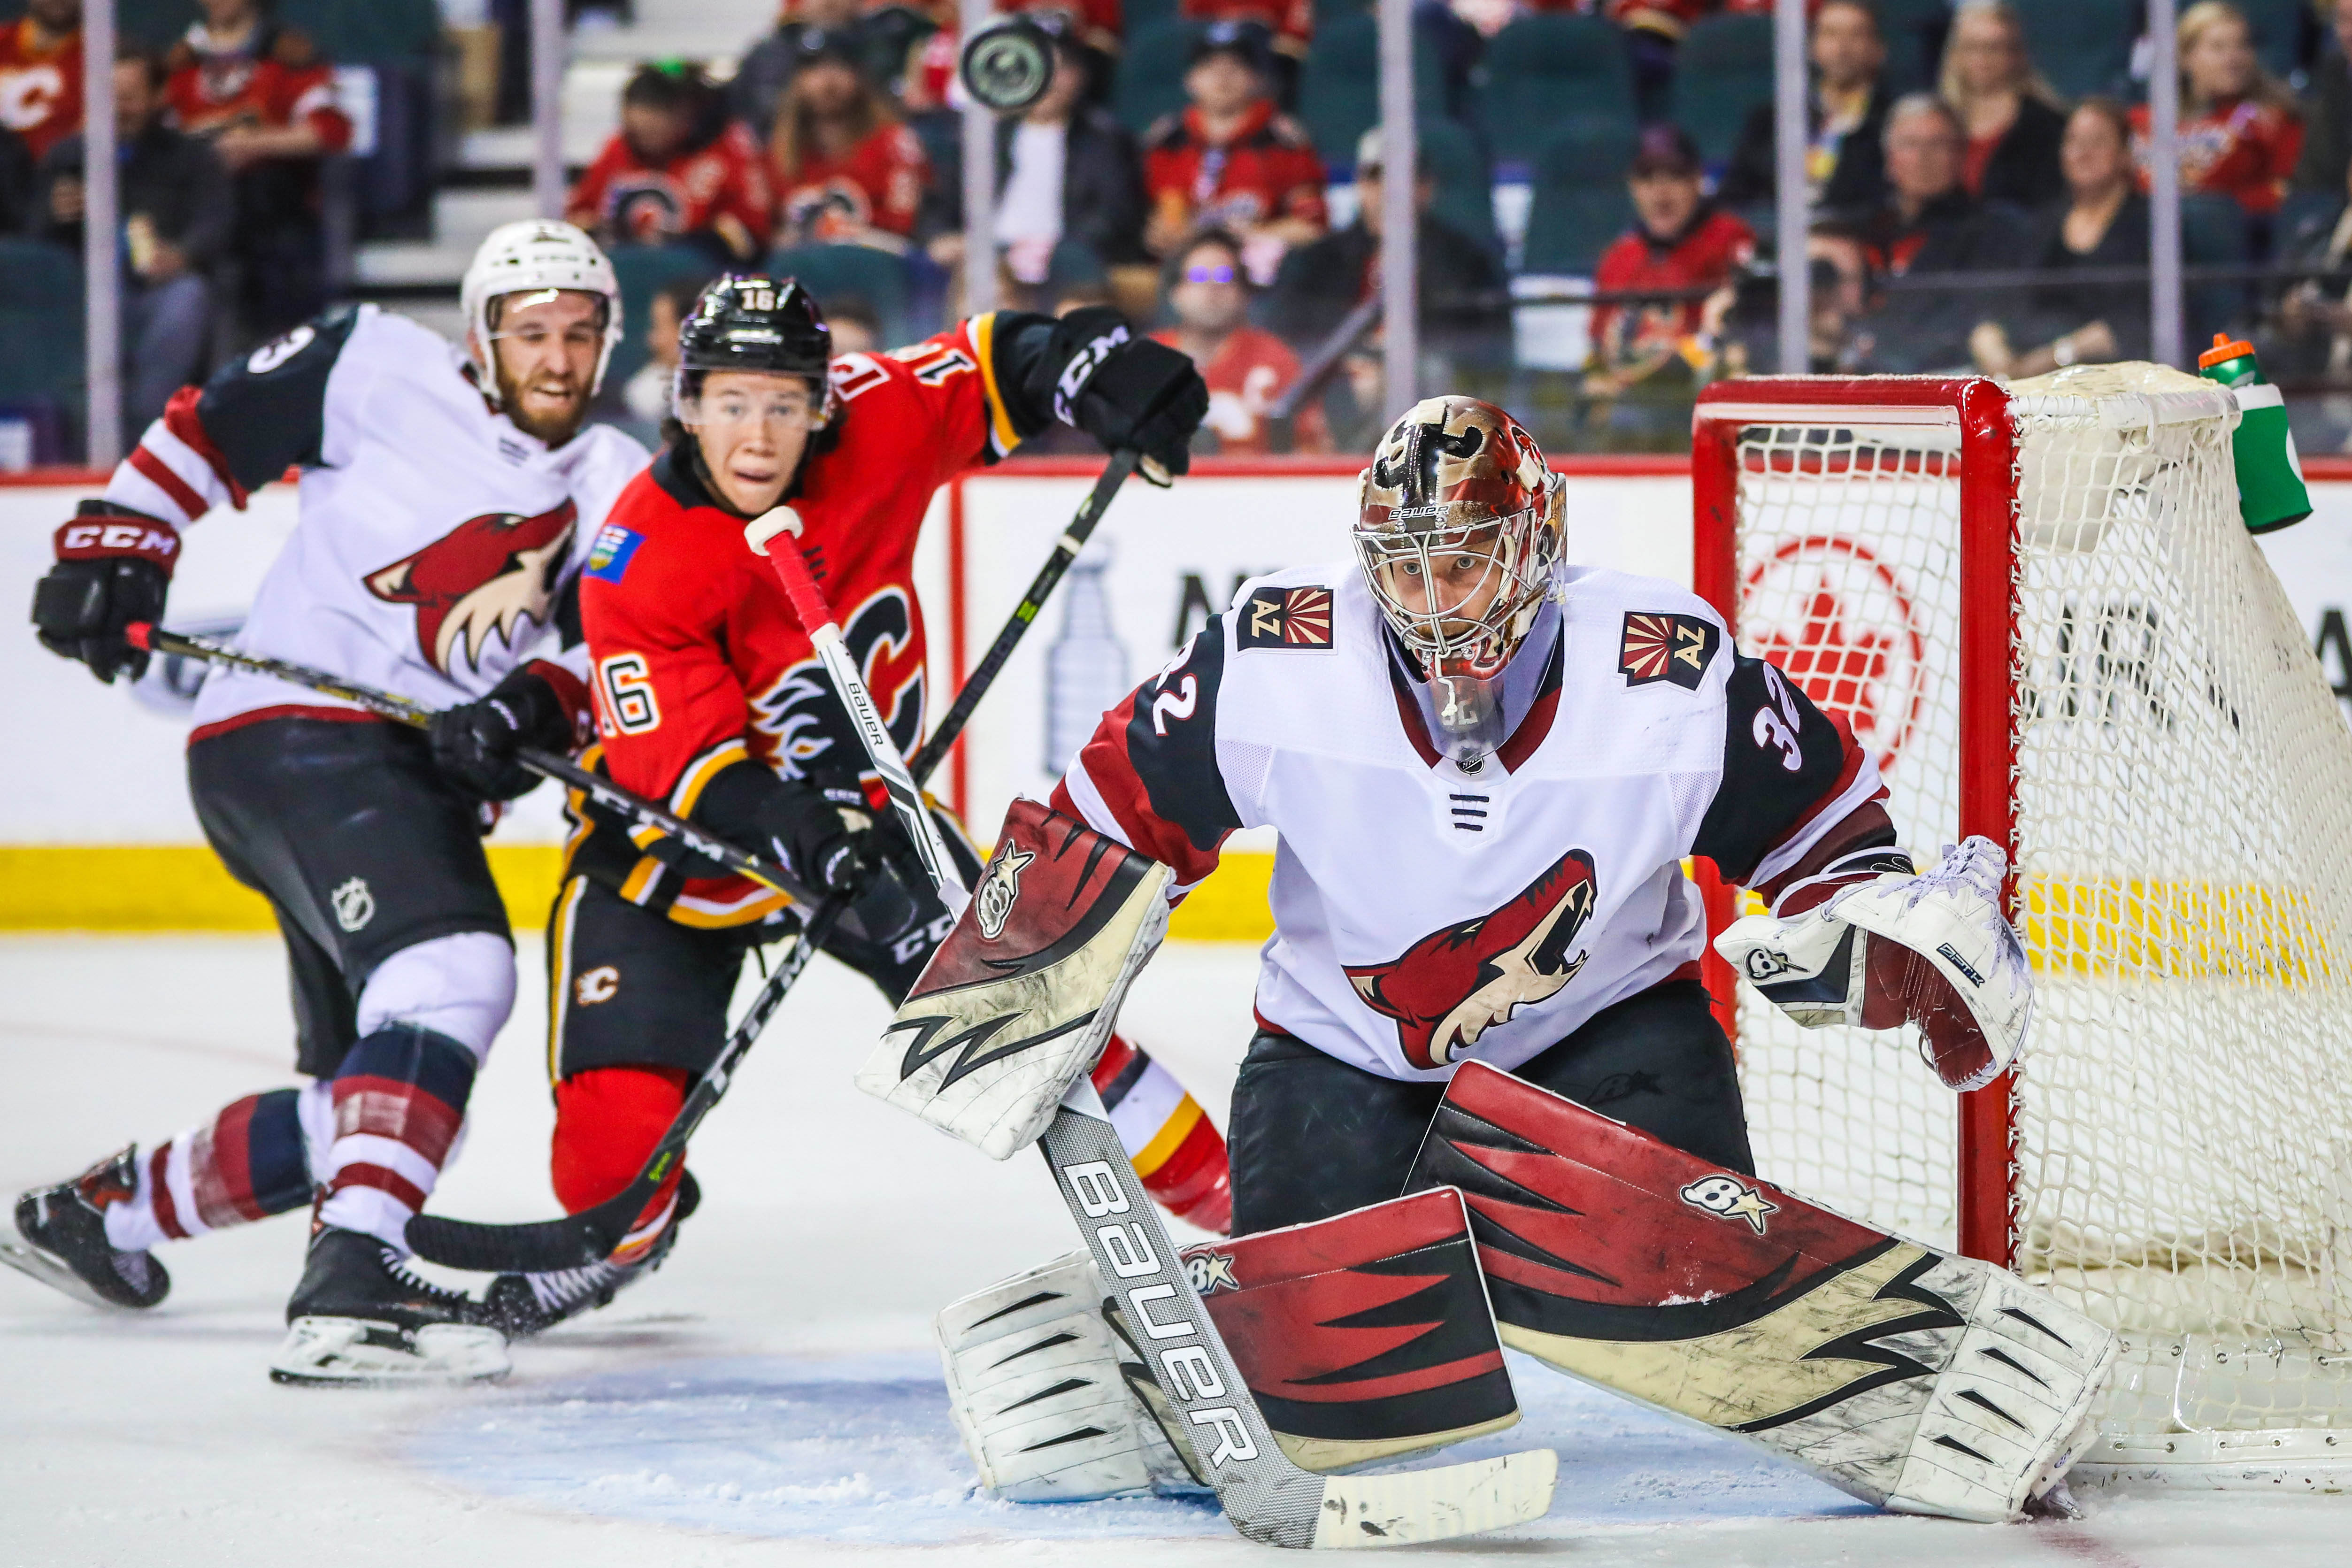 Apr 3, 2018; Calgary, Alberta, CAN; Arizona Coyotes goaltender Antti Raanta (32) guards his net against the Calgary Flames during the third period at Scotiabank Saddledome. Arizona Coyotes won 4-1.